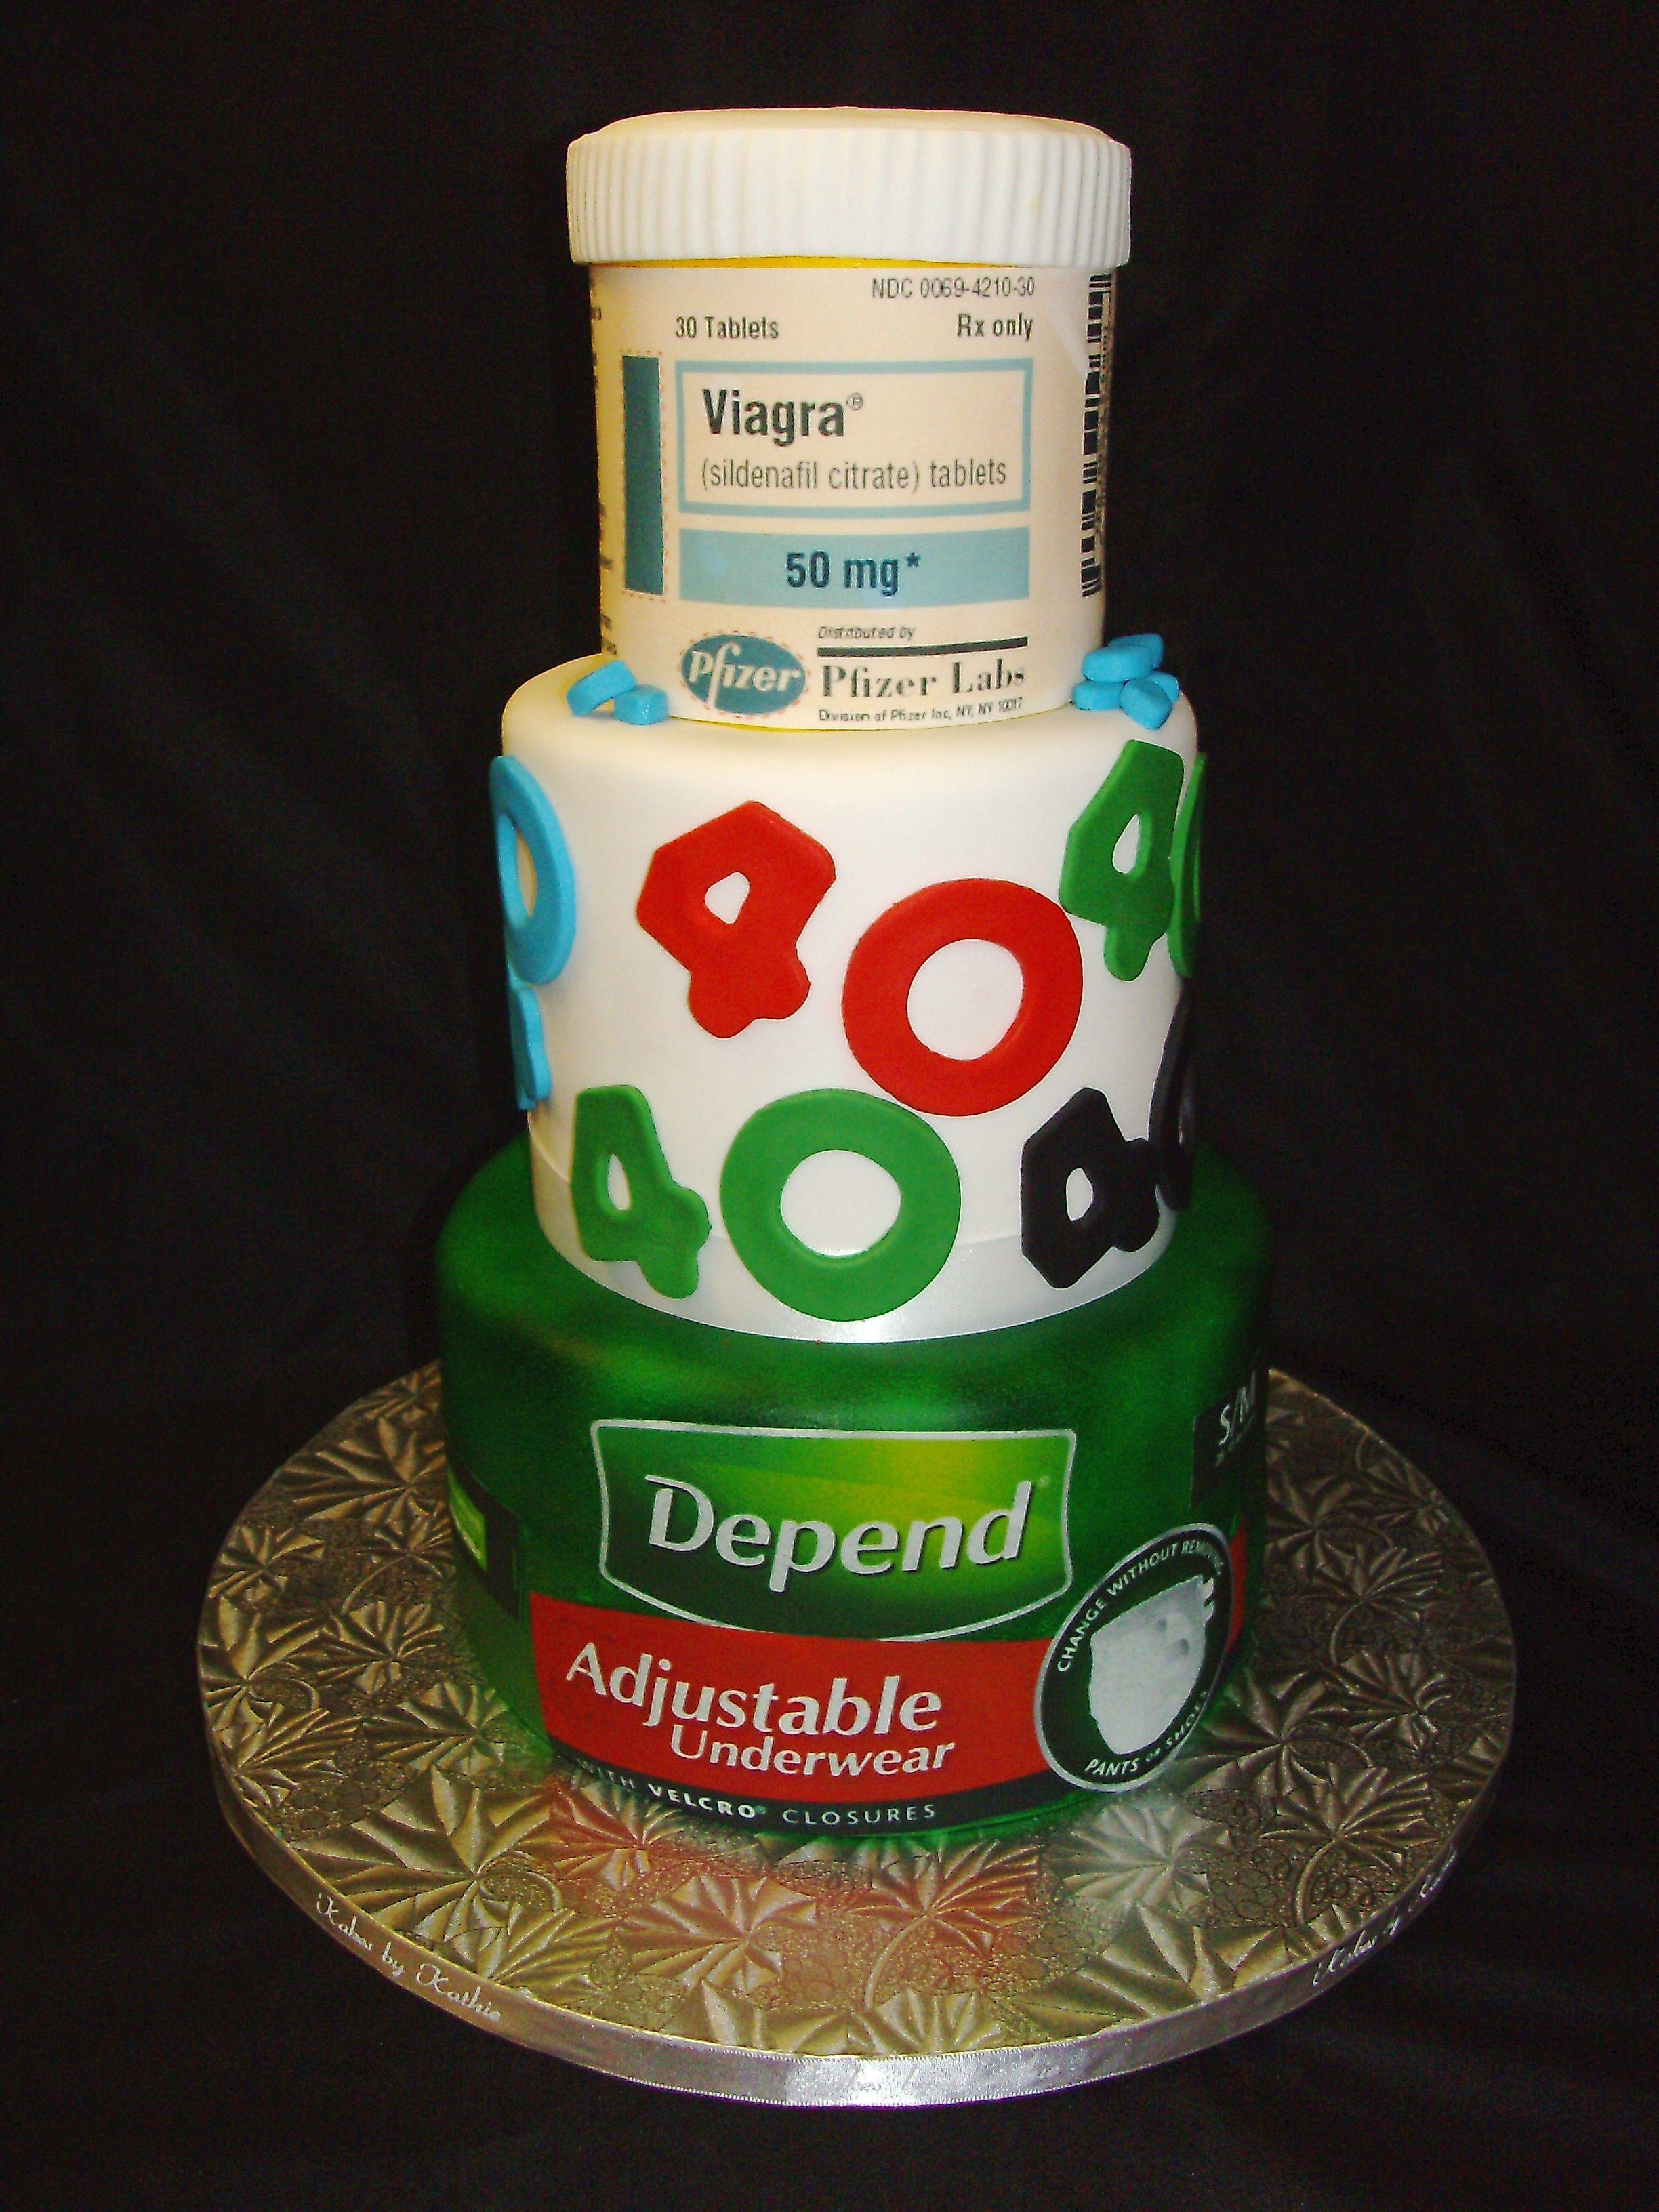 30 Trends Ideas Funny 40th Birthday Cake Ideas For Her Boudoir Paris